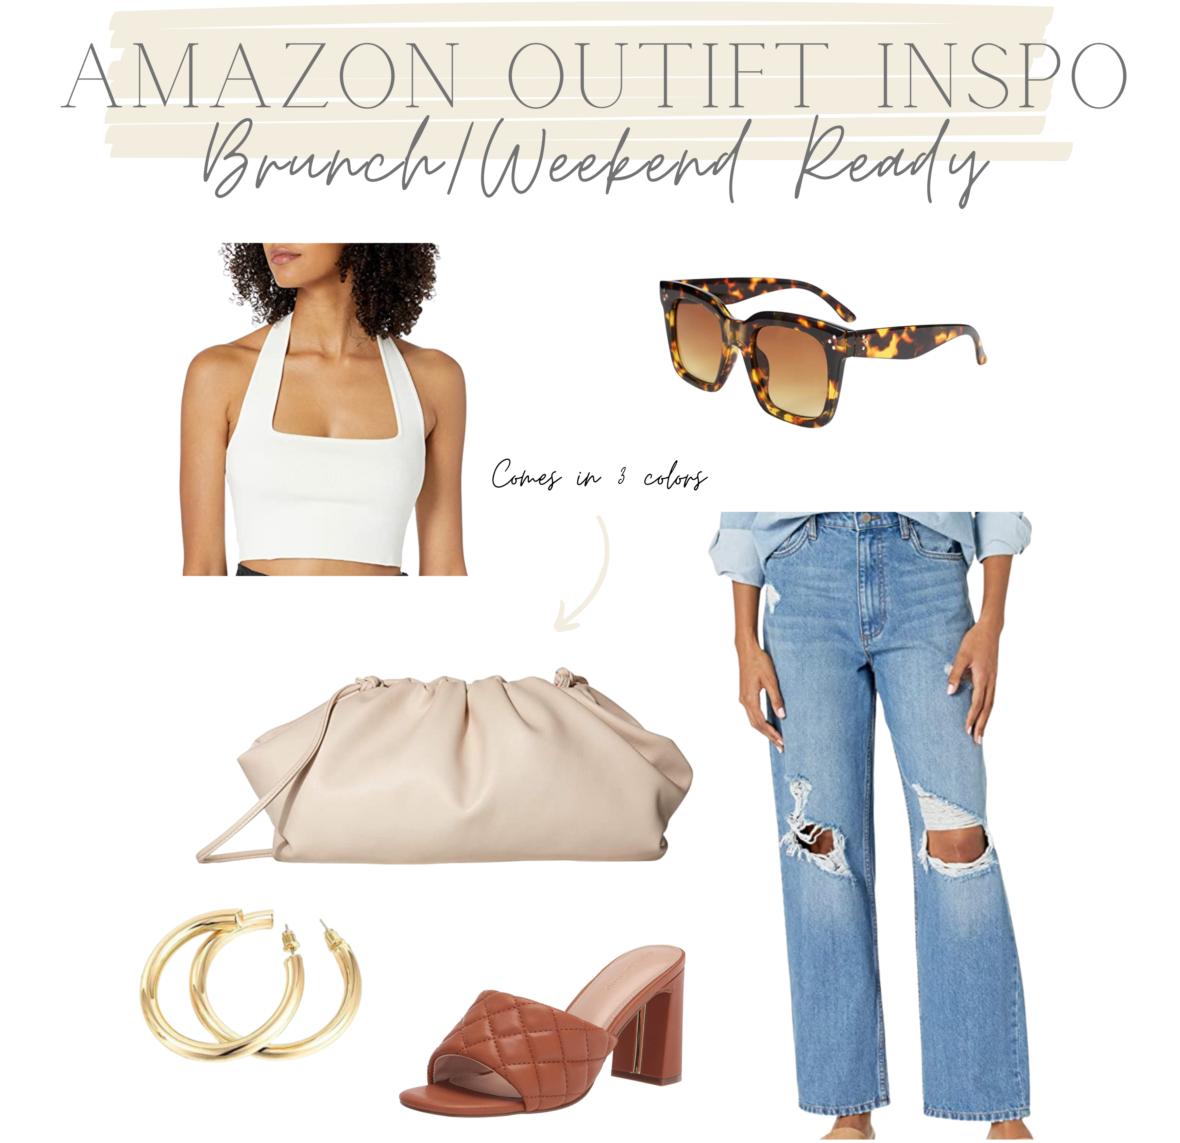 amazon, amazon clutch, cream clutch, amazon denim, denim jeans, sunglasses, amazon outfit